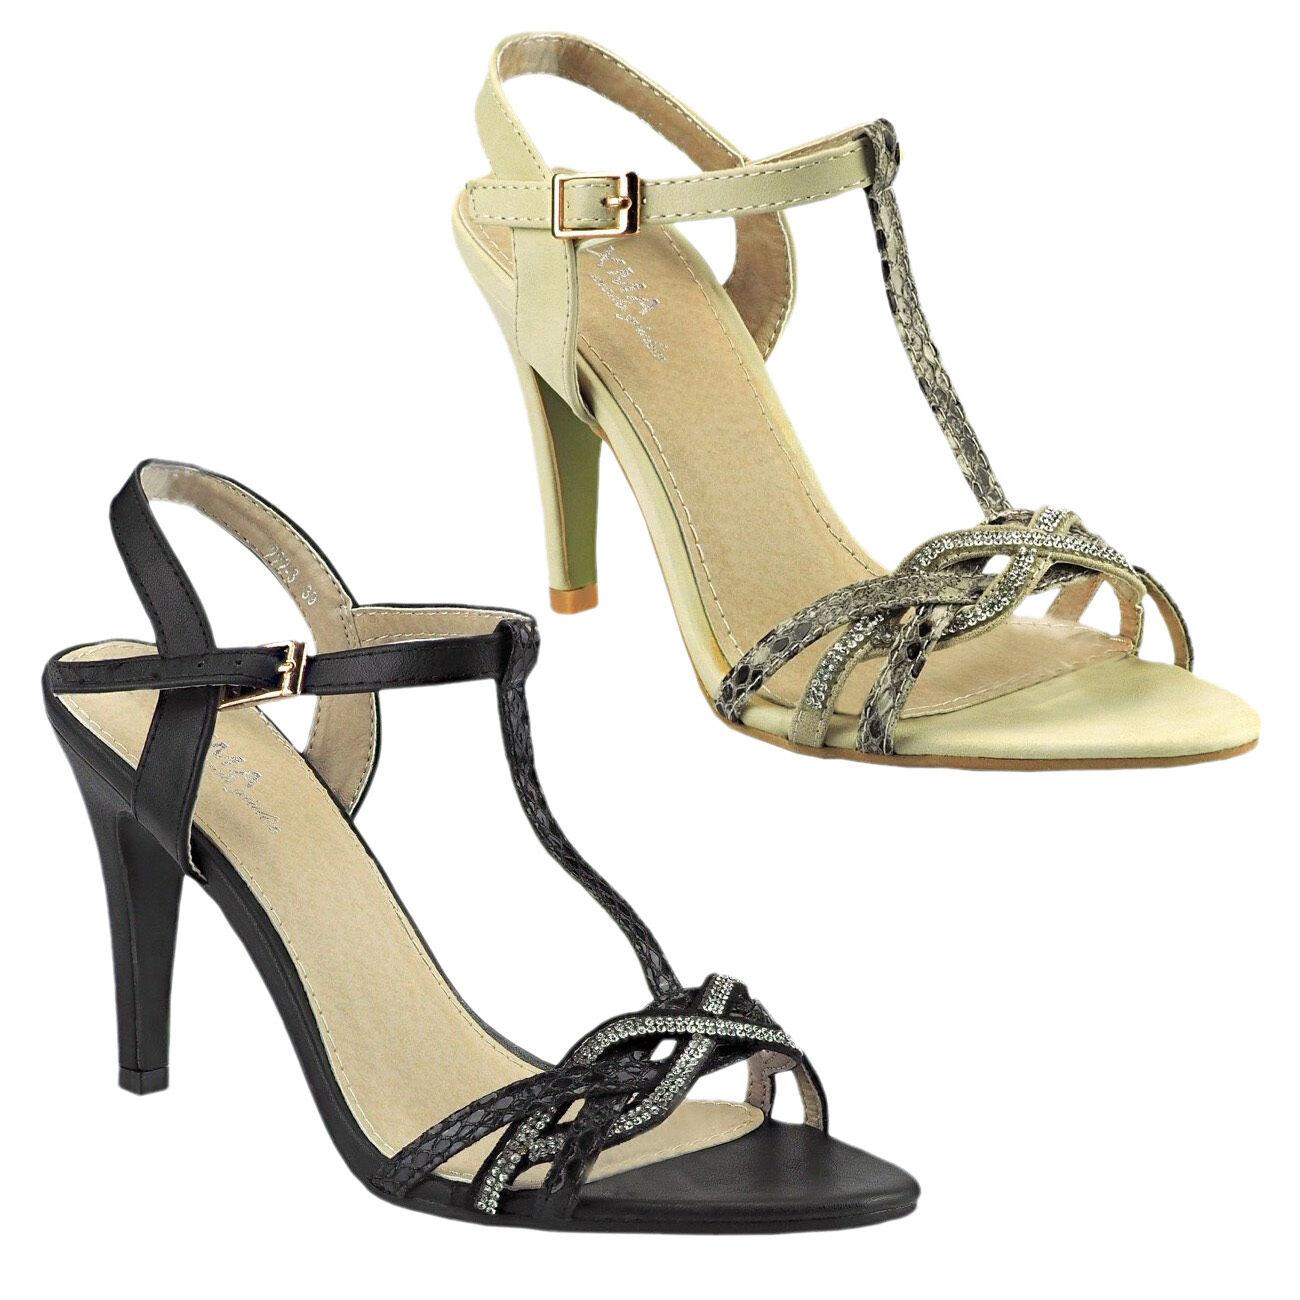 20034 SEXY SANDALO DONNA CINTURINO SANDALO col tacco alto scarpe donna PIETRINE